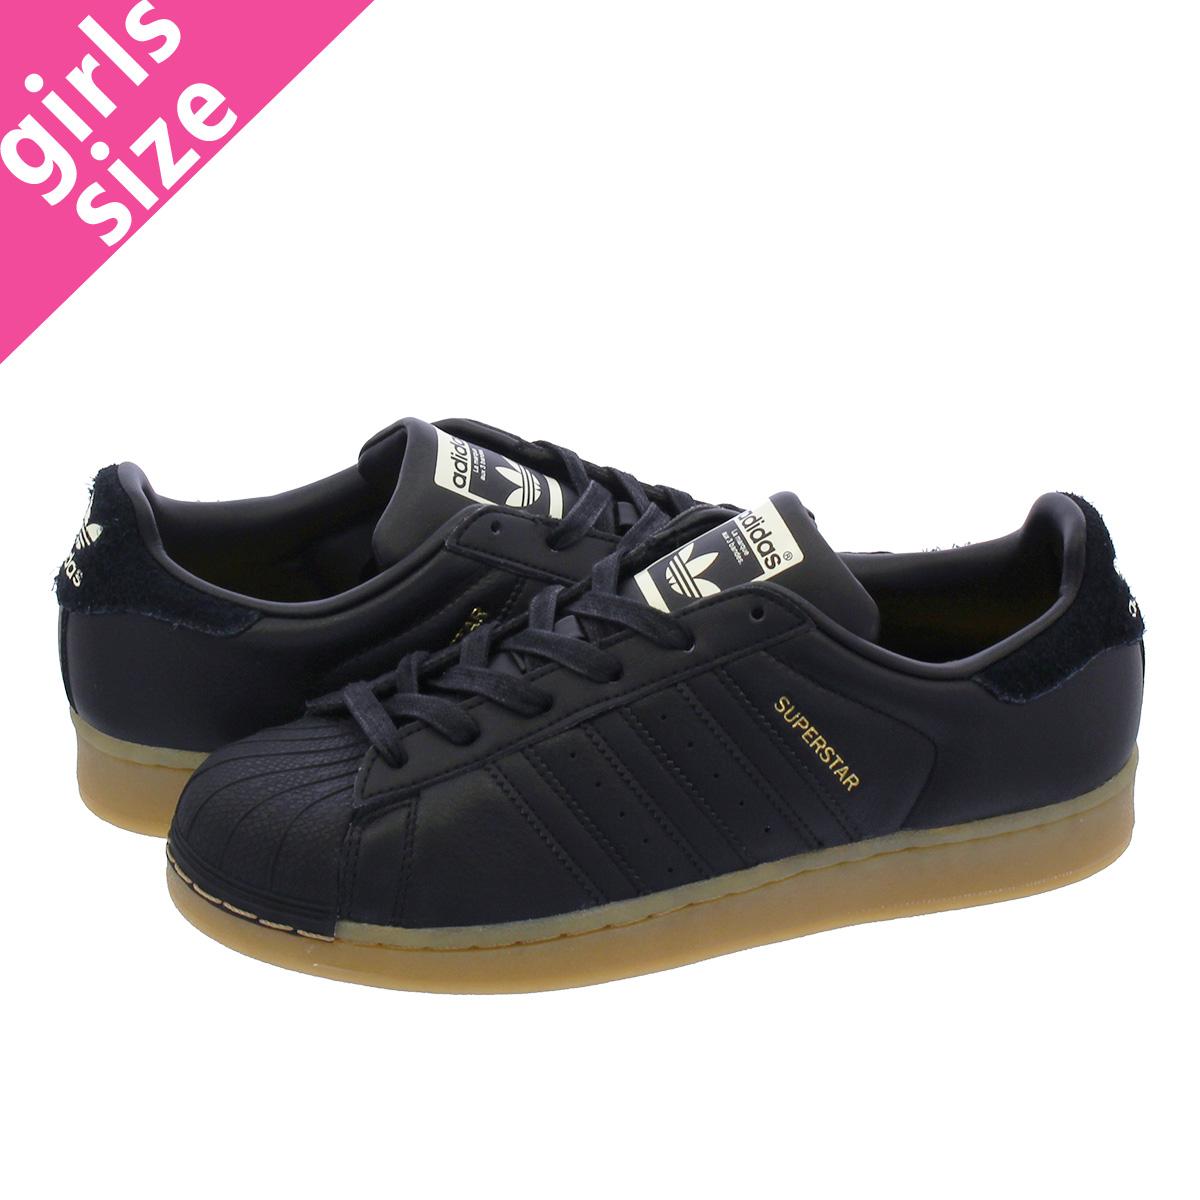 adidas SUPERSTAR W Adidas superstar W CORE BLACK/CORE BLACK/GUM b37148